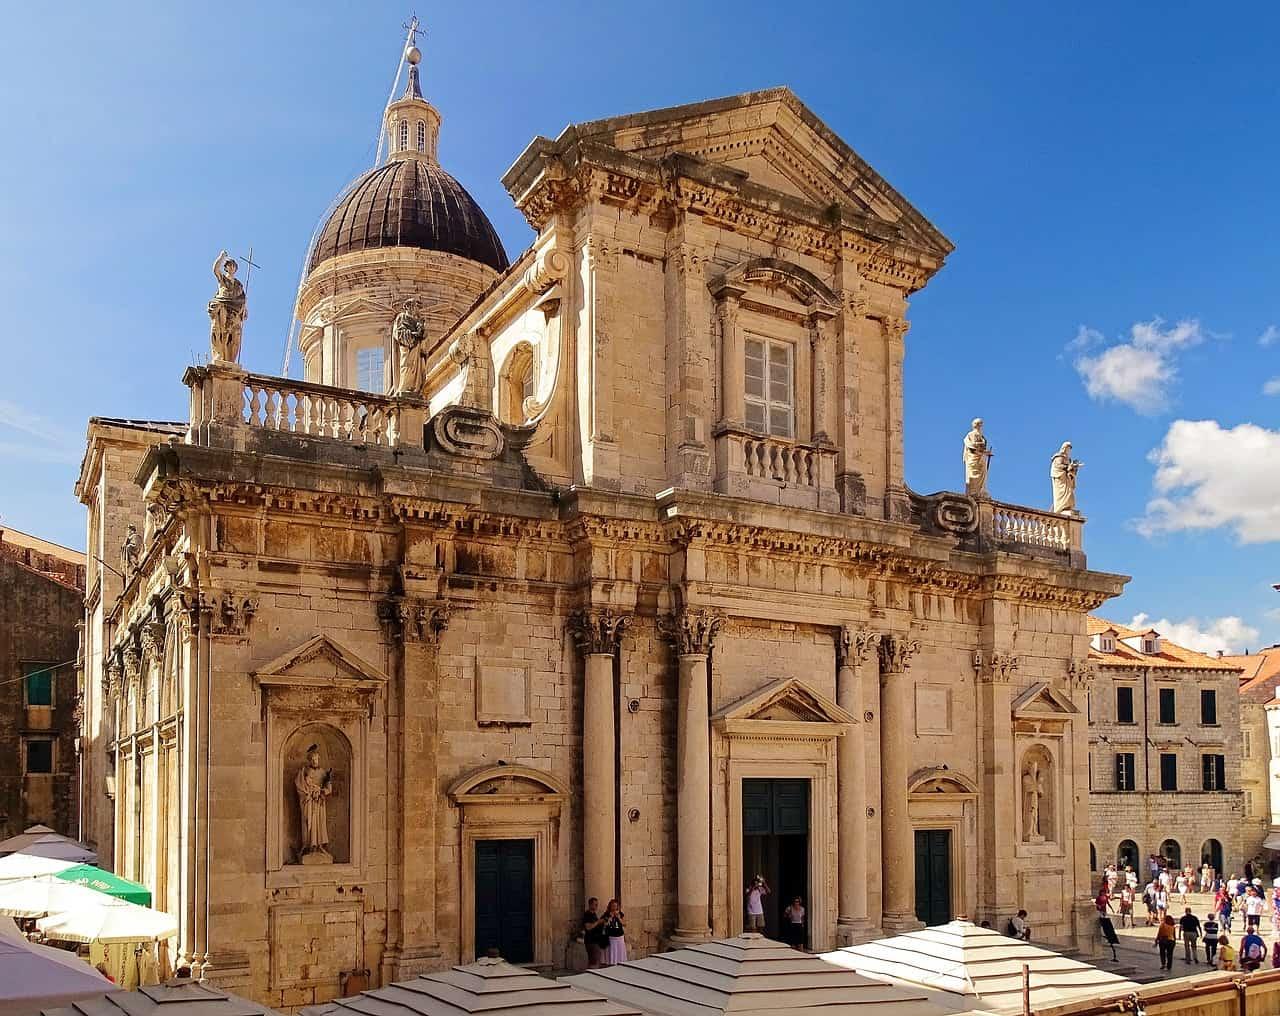 Go inside the Dubrovnik Cathedral